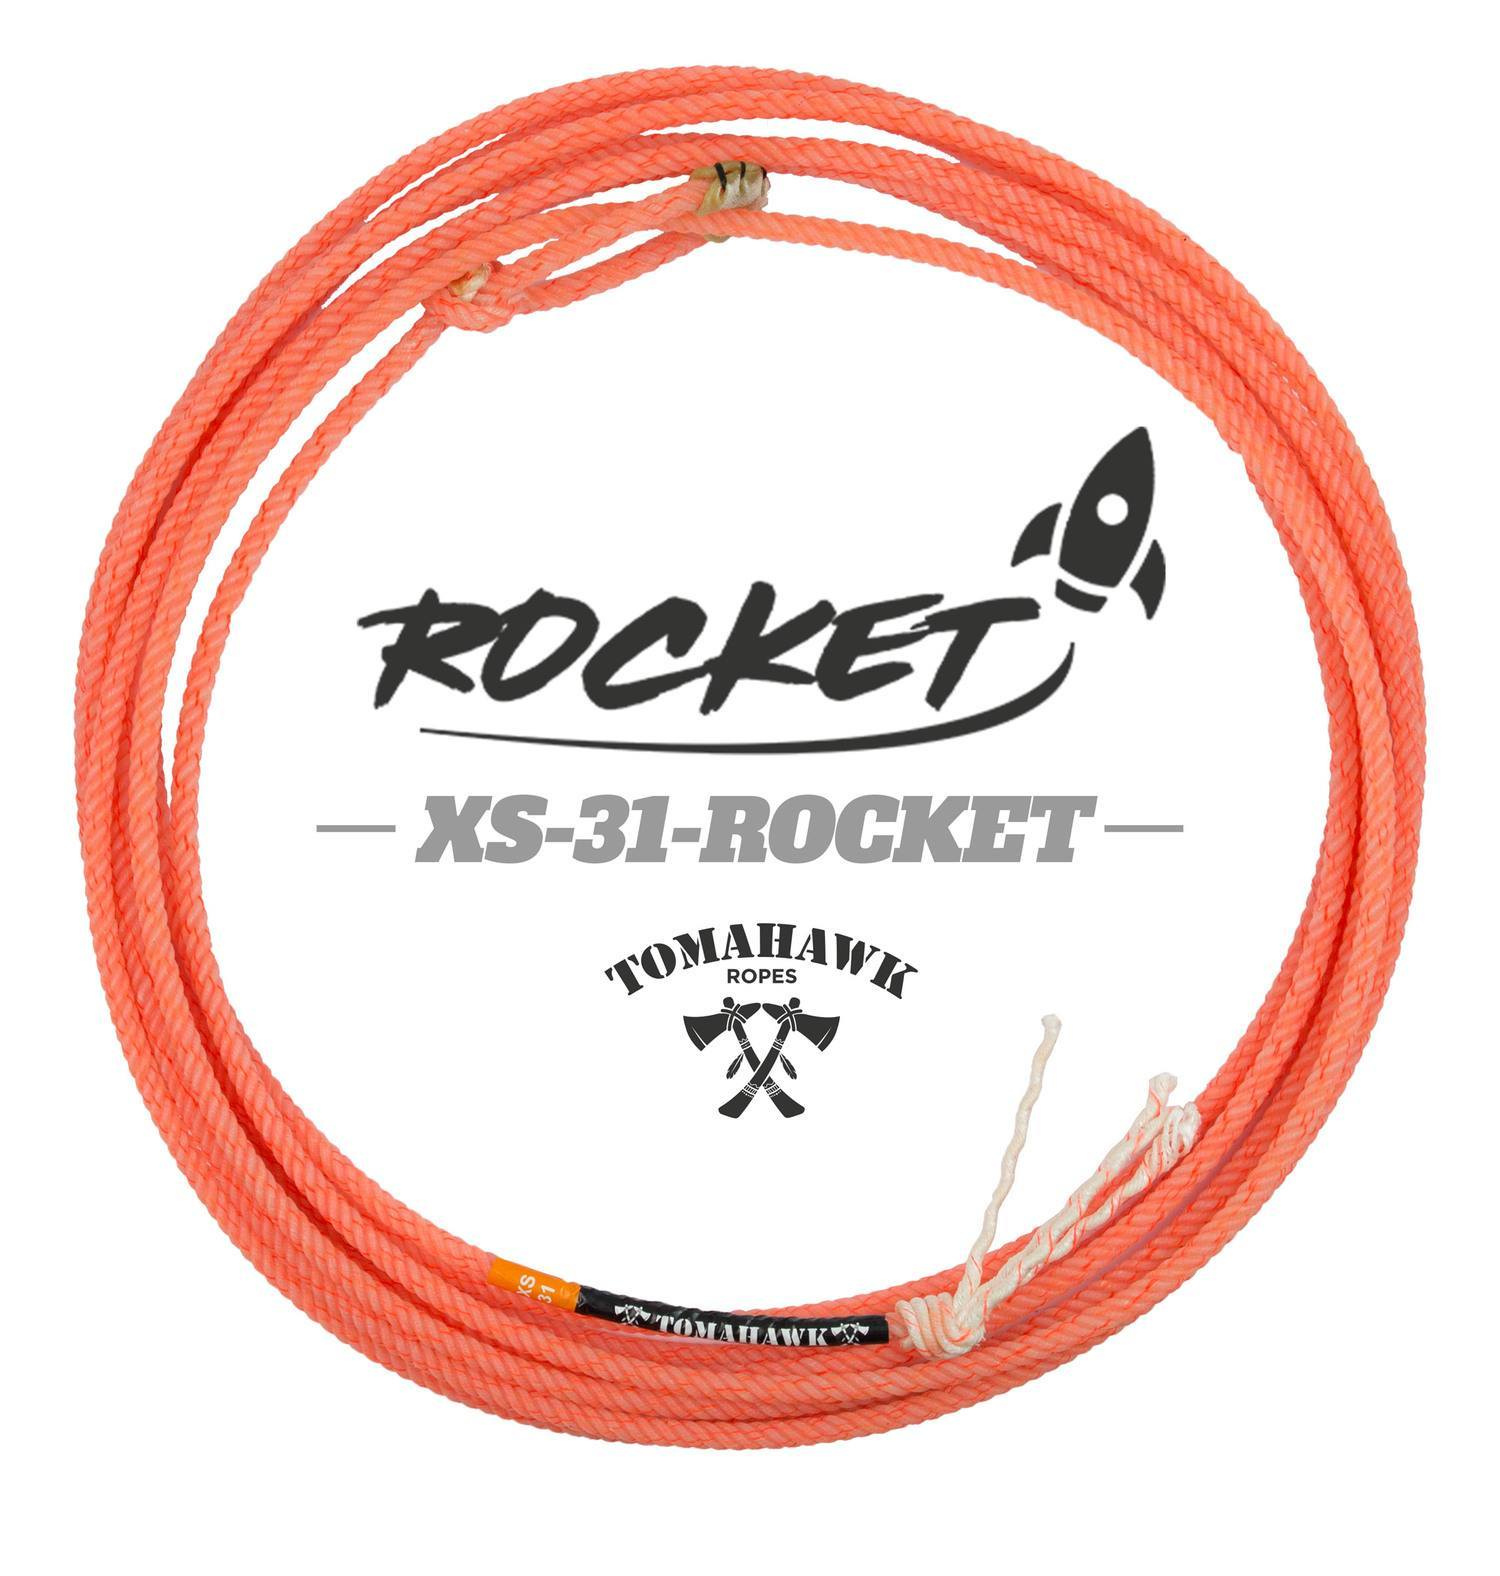 Corda Cabeça Tomahawk XS 31 Rocket